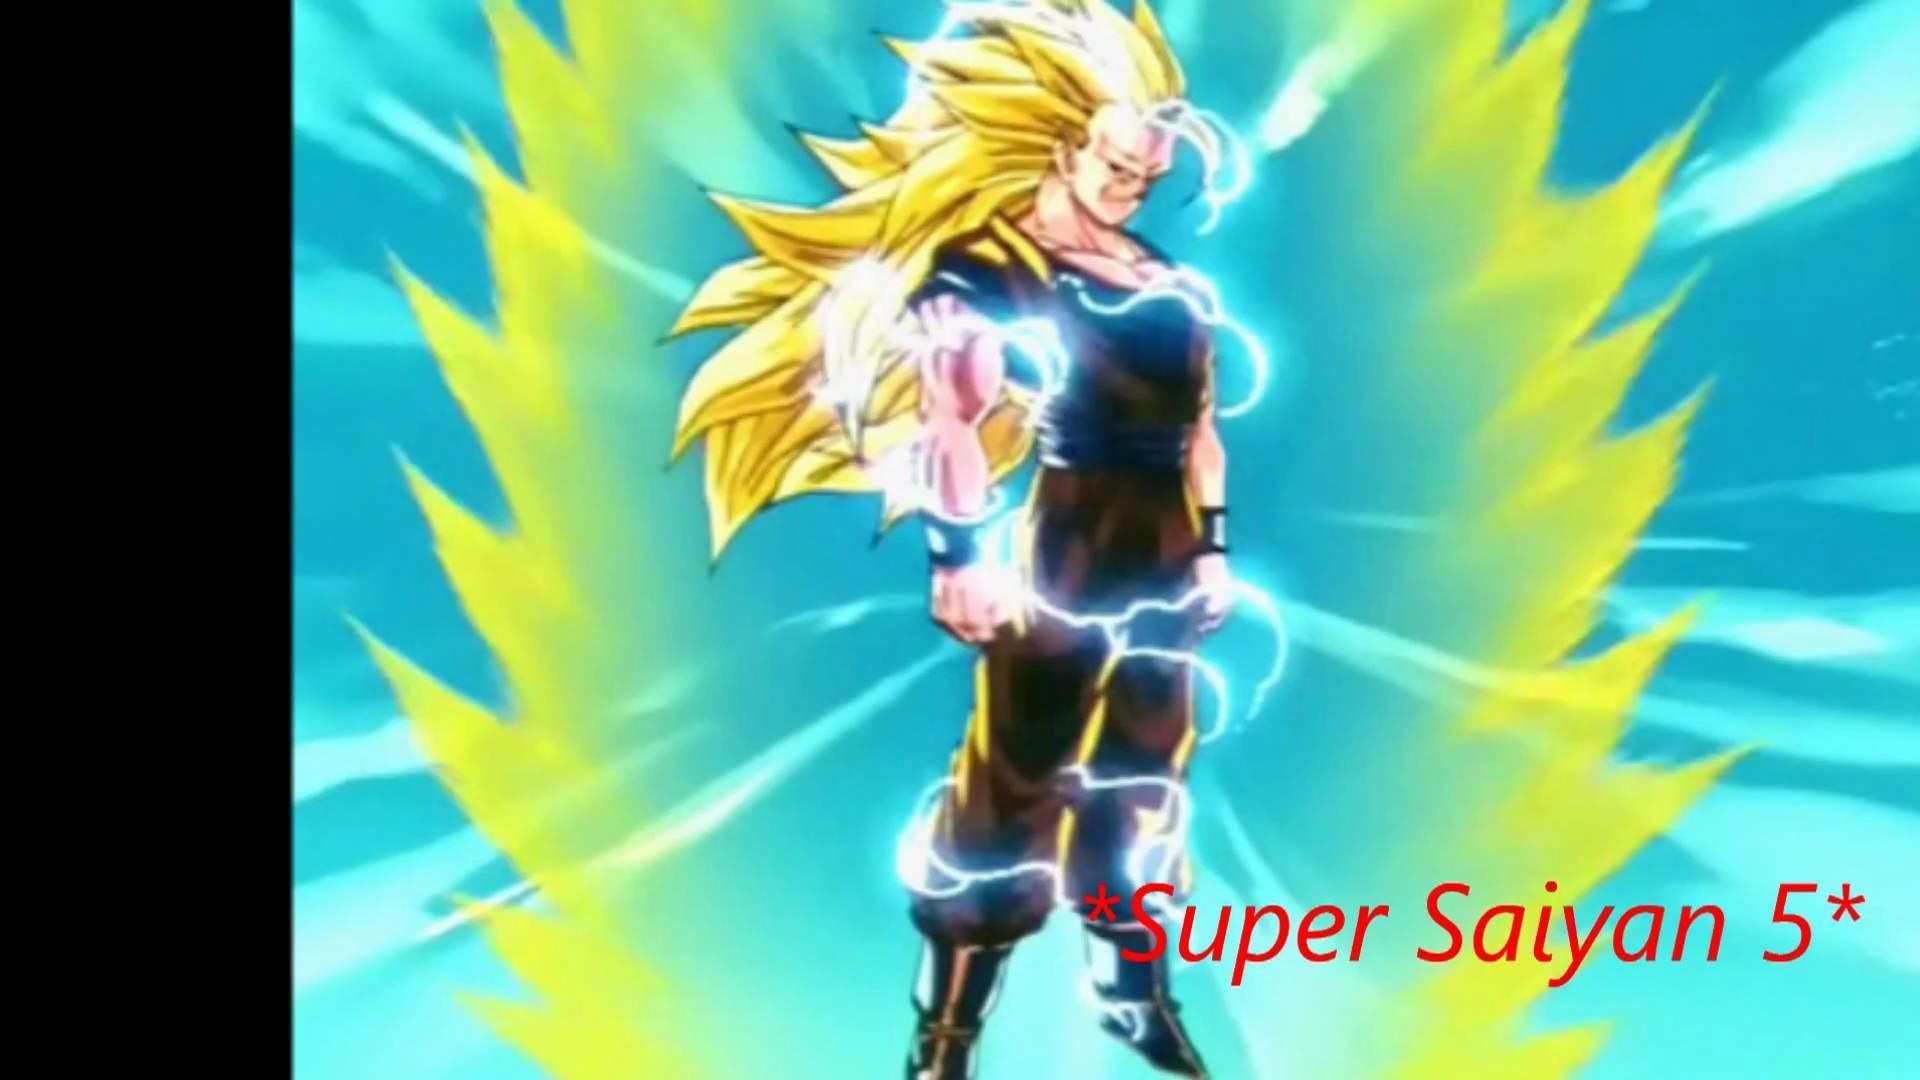 Super Saiyan 5 Wallpaper 63 Images